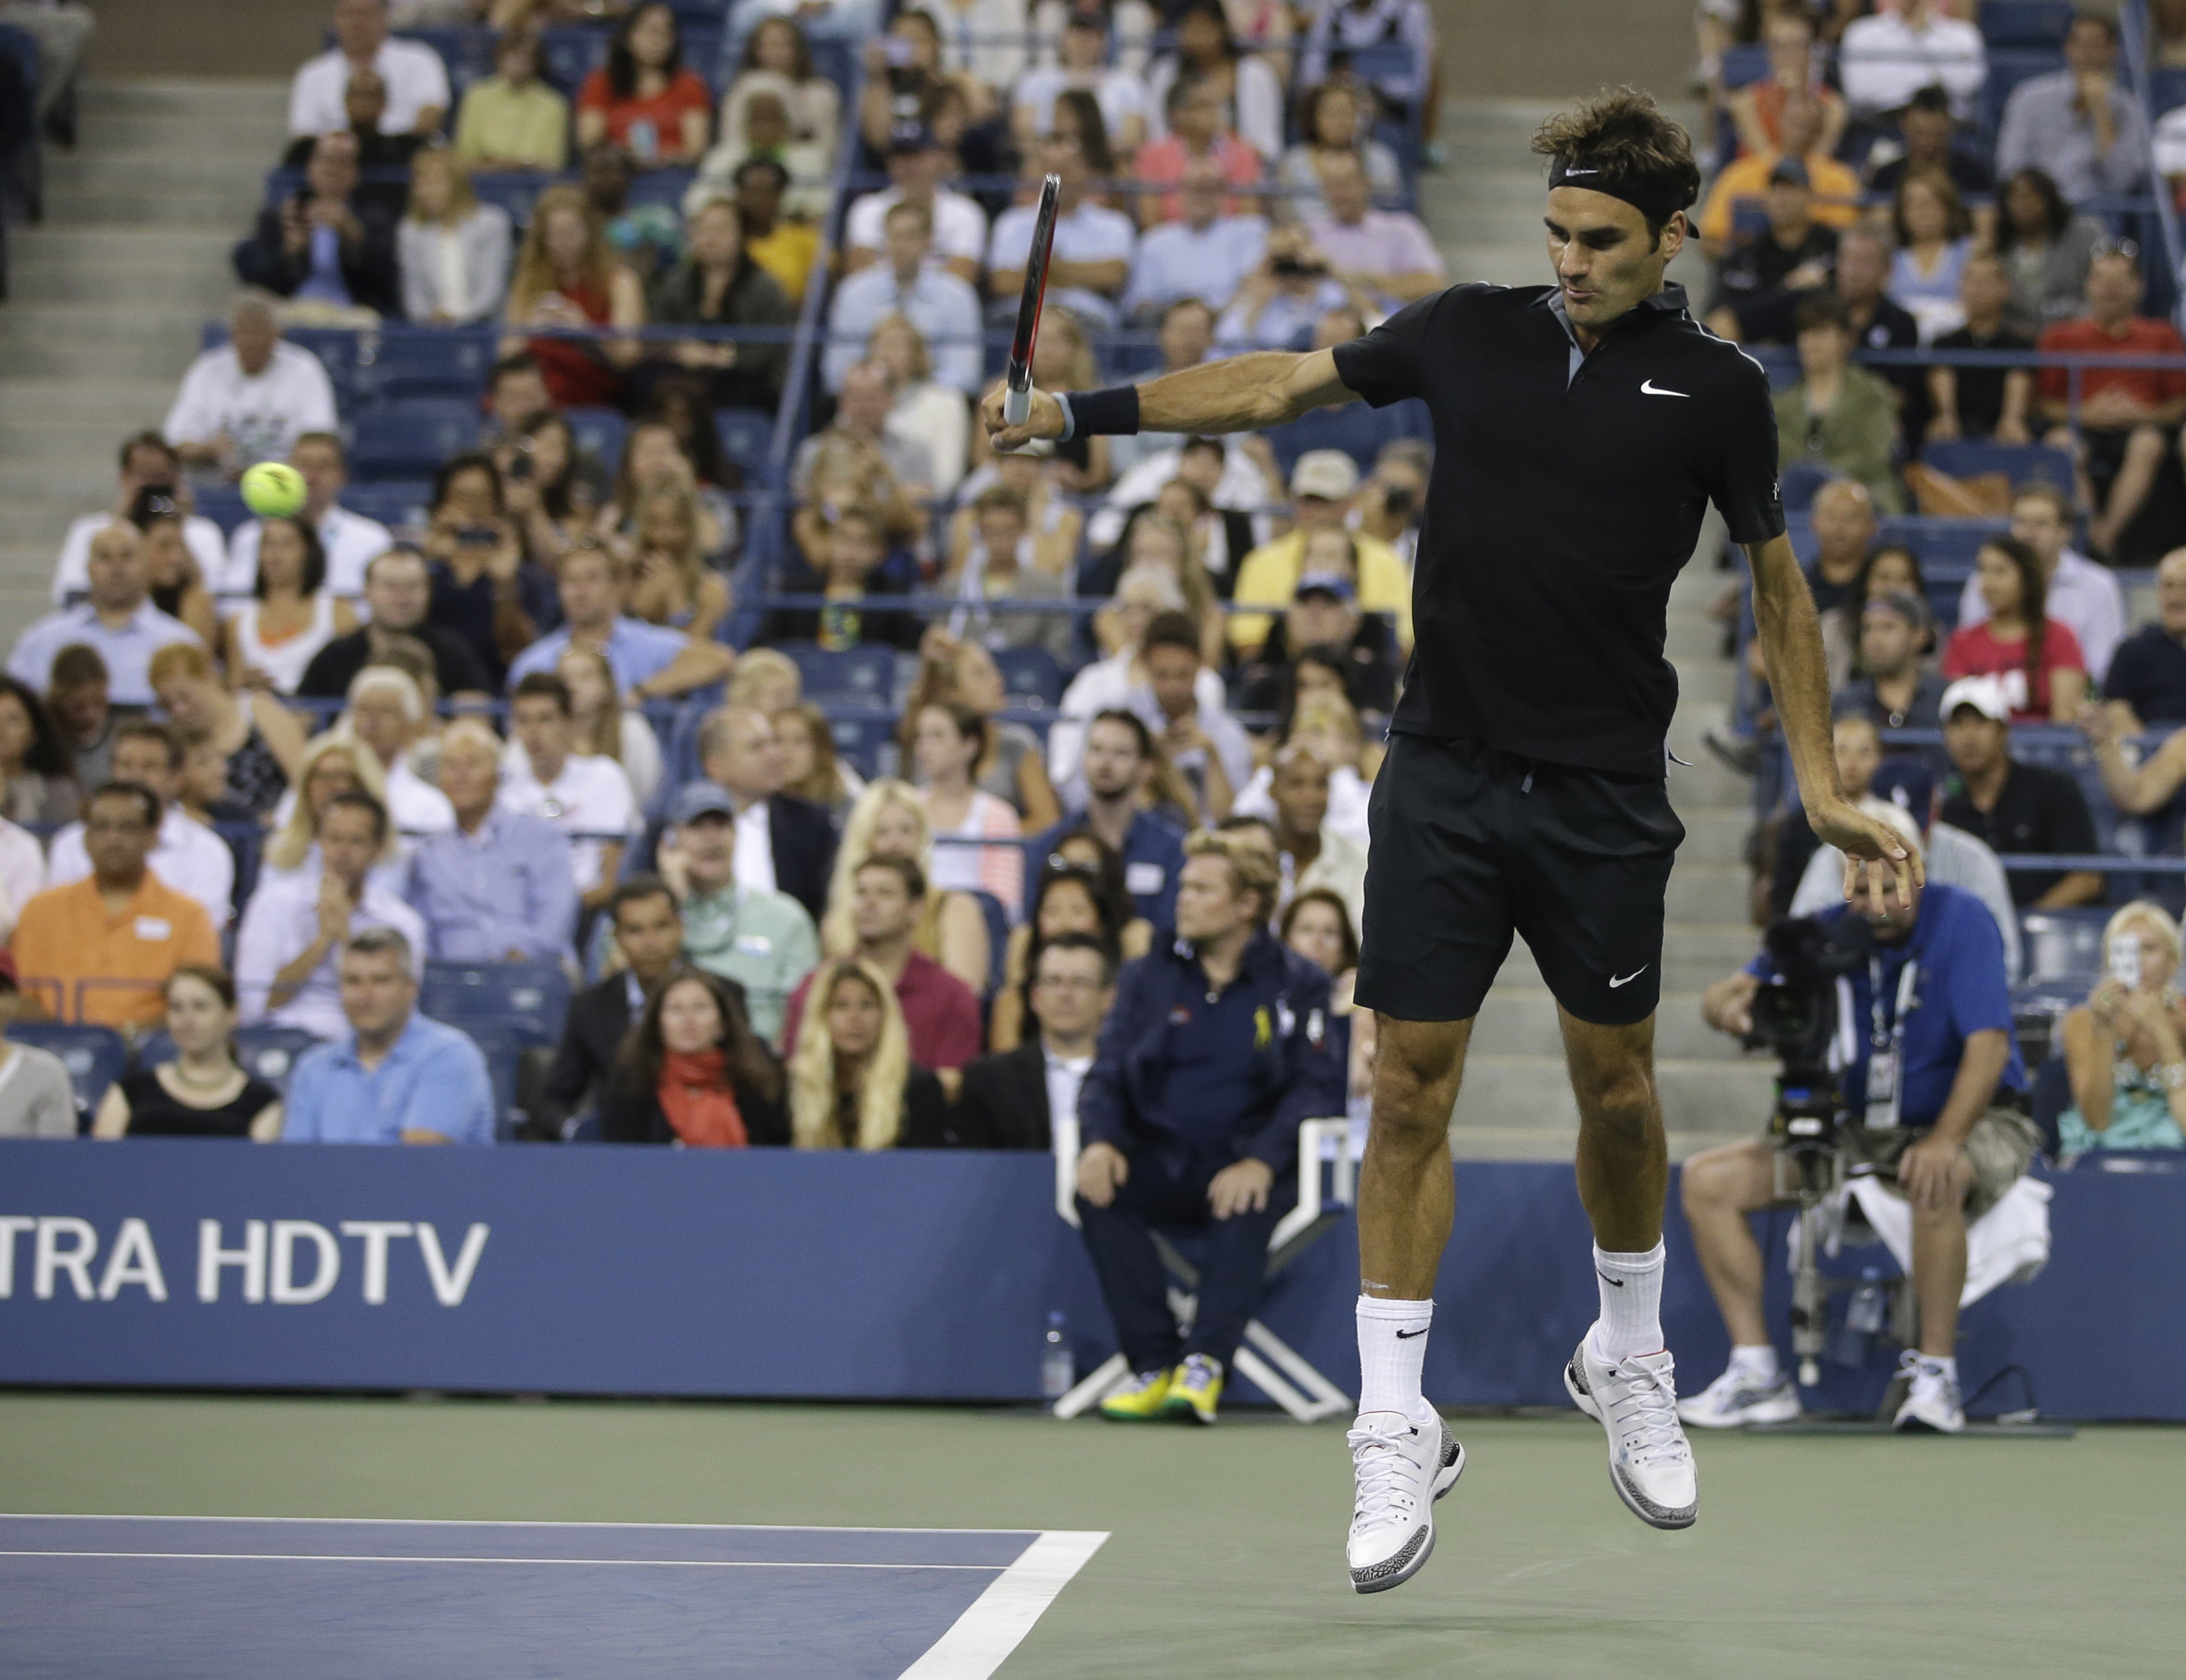 Darth Federer, version 2.0 at the U.S. Open.